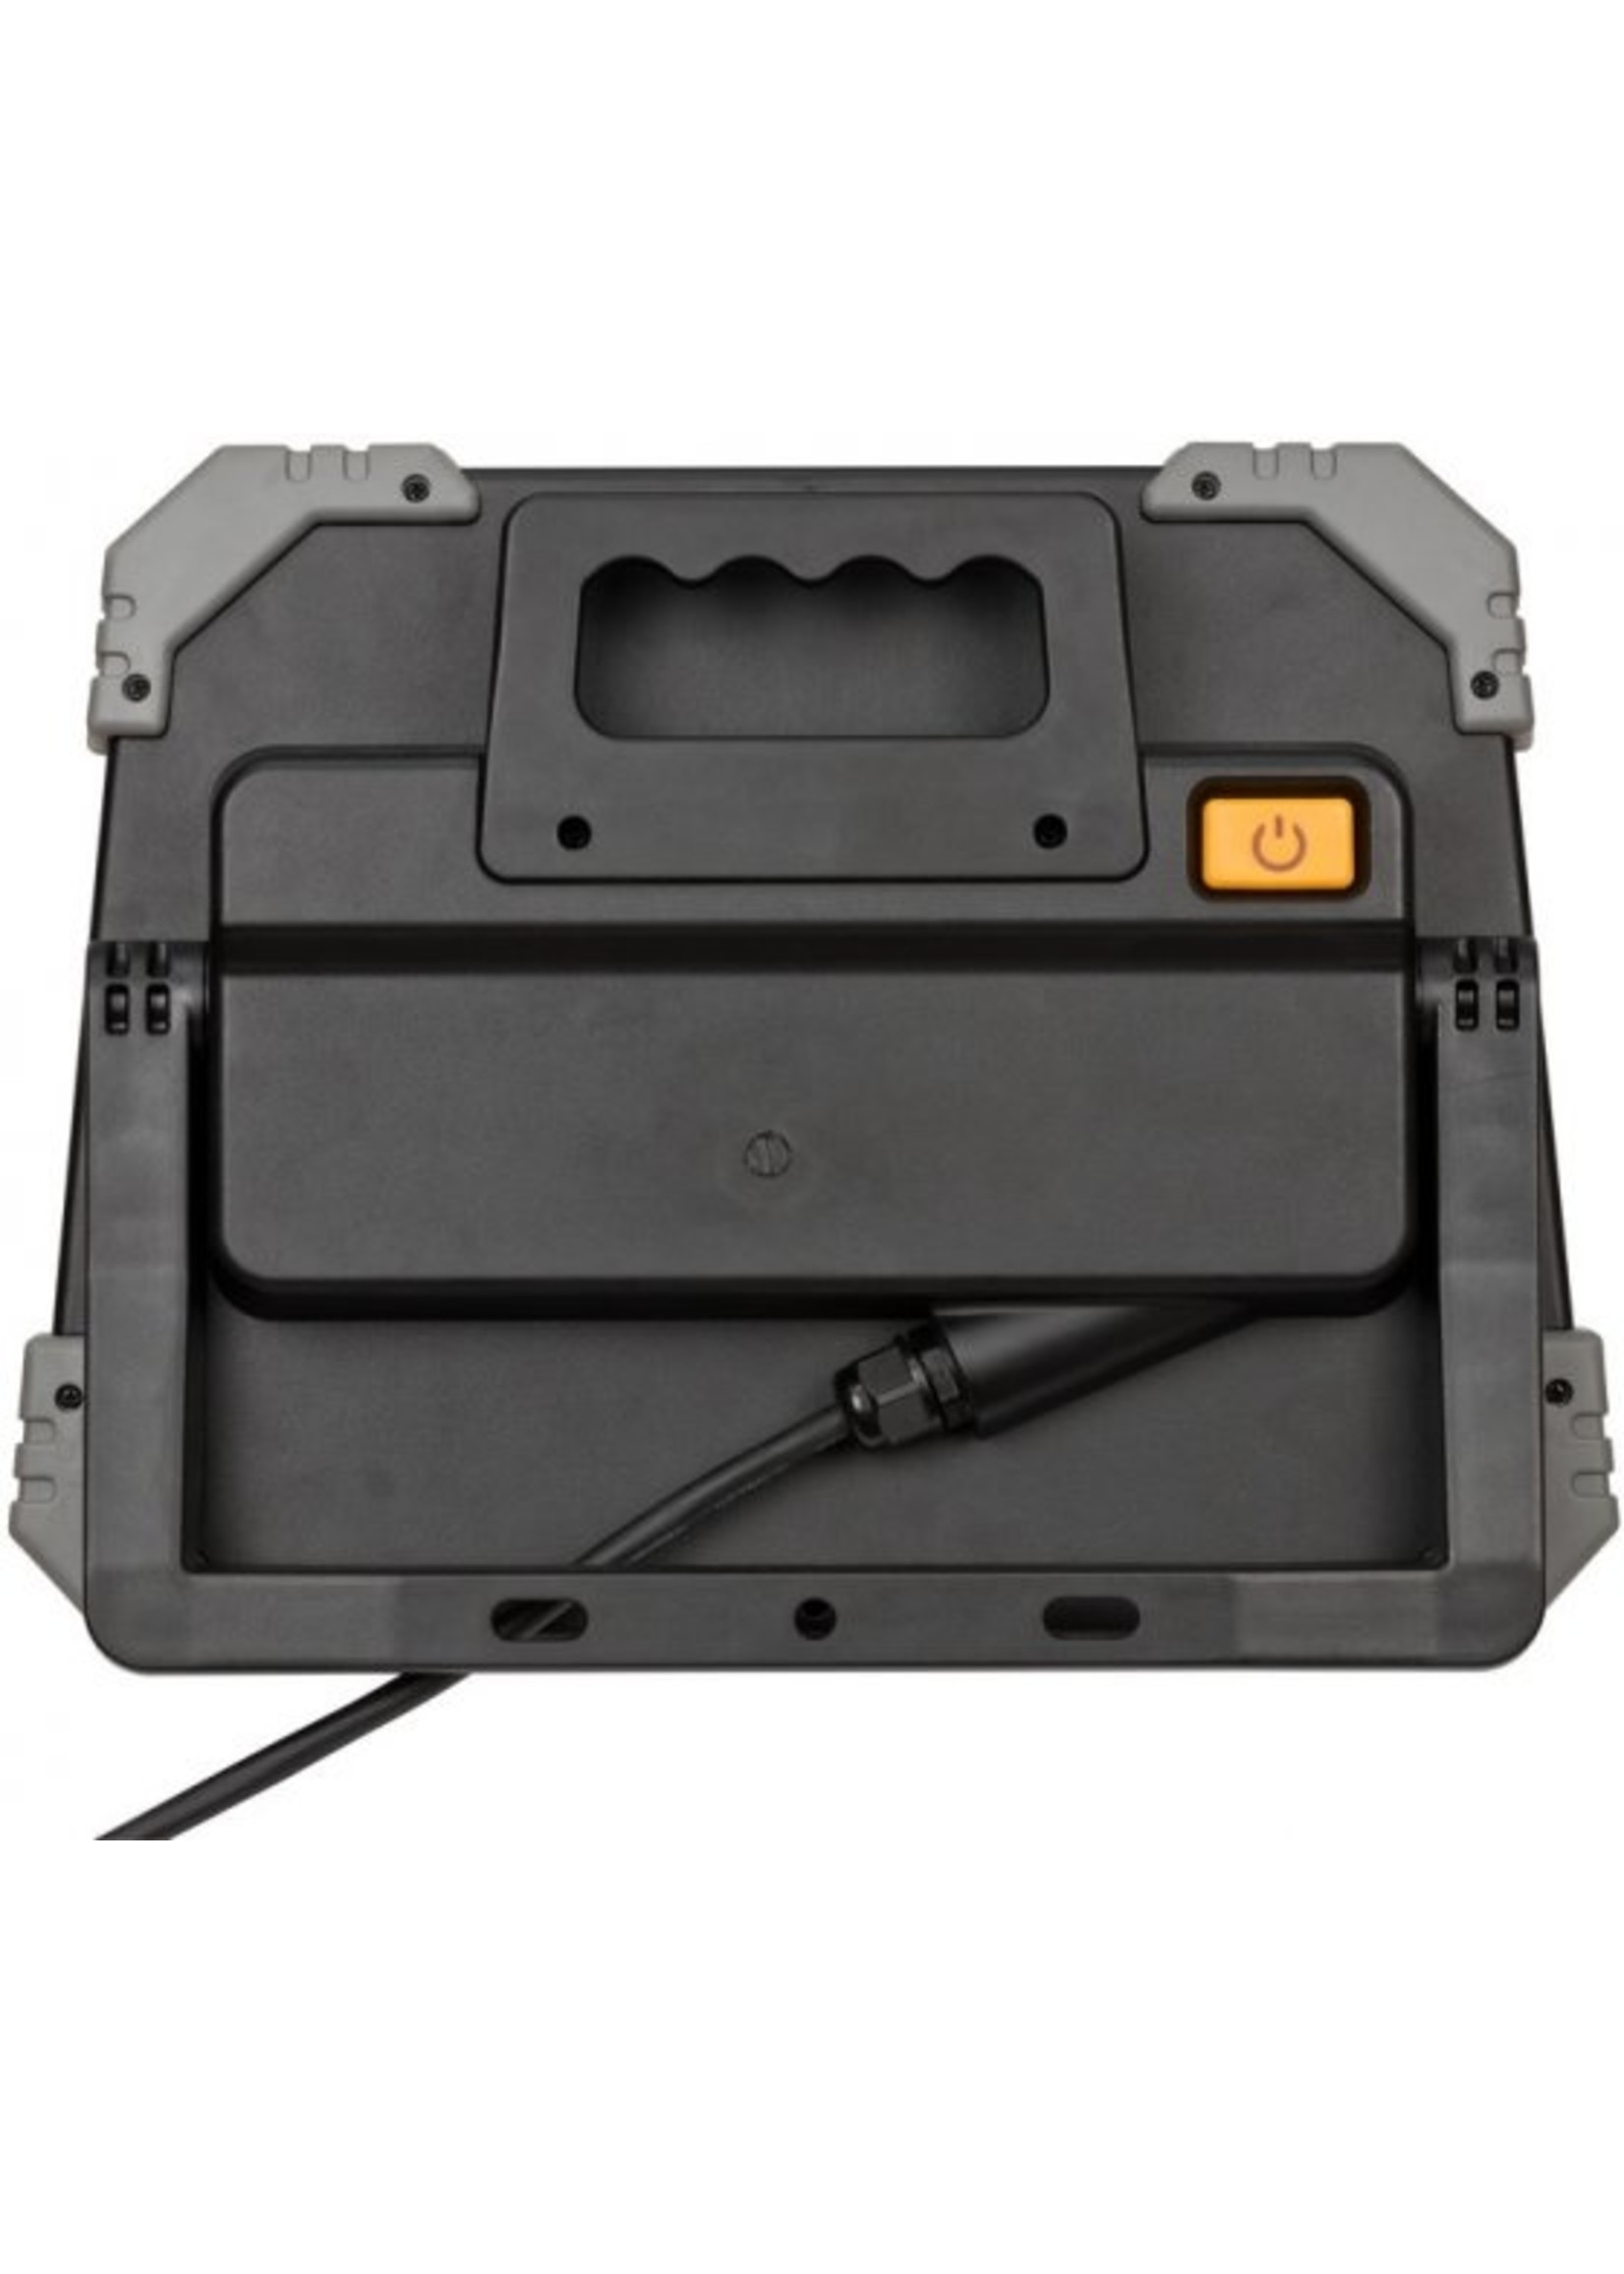 Brennenstuhl Mobiele LED straler DINORA 5050 IP65 5m H07RN-F 2x1,0 5100lm